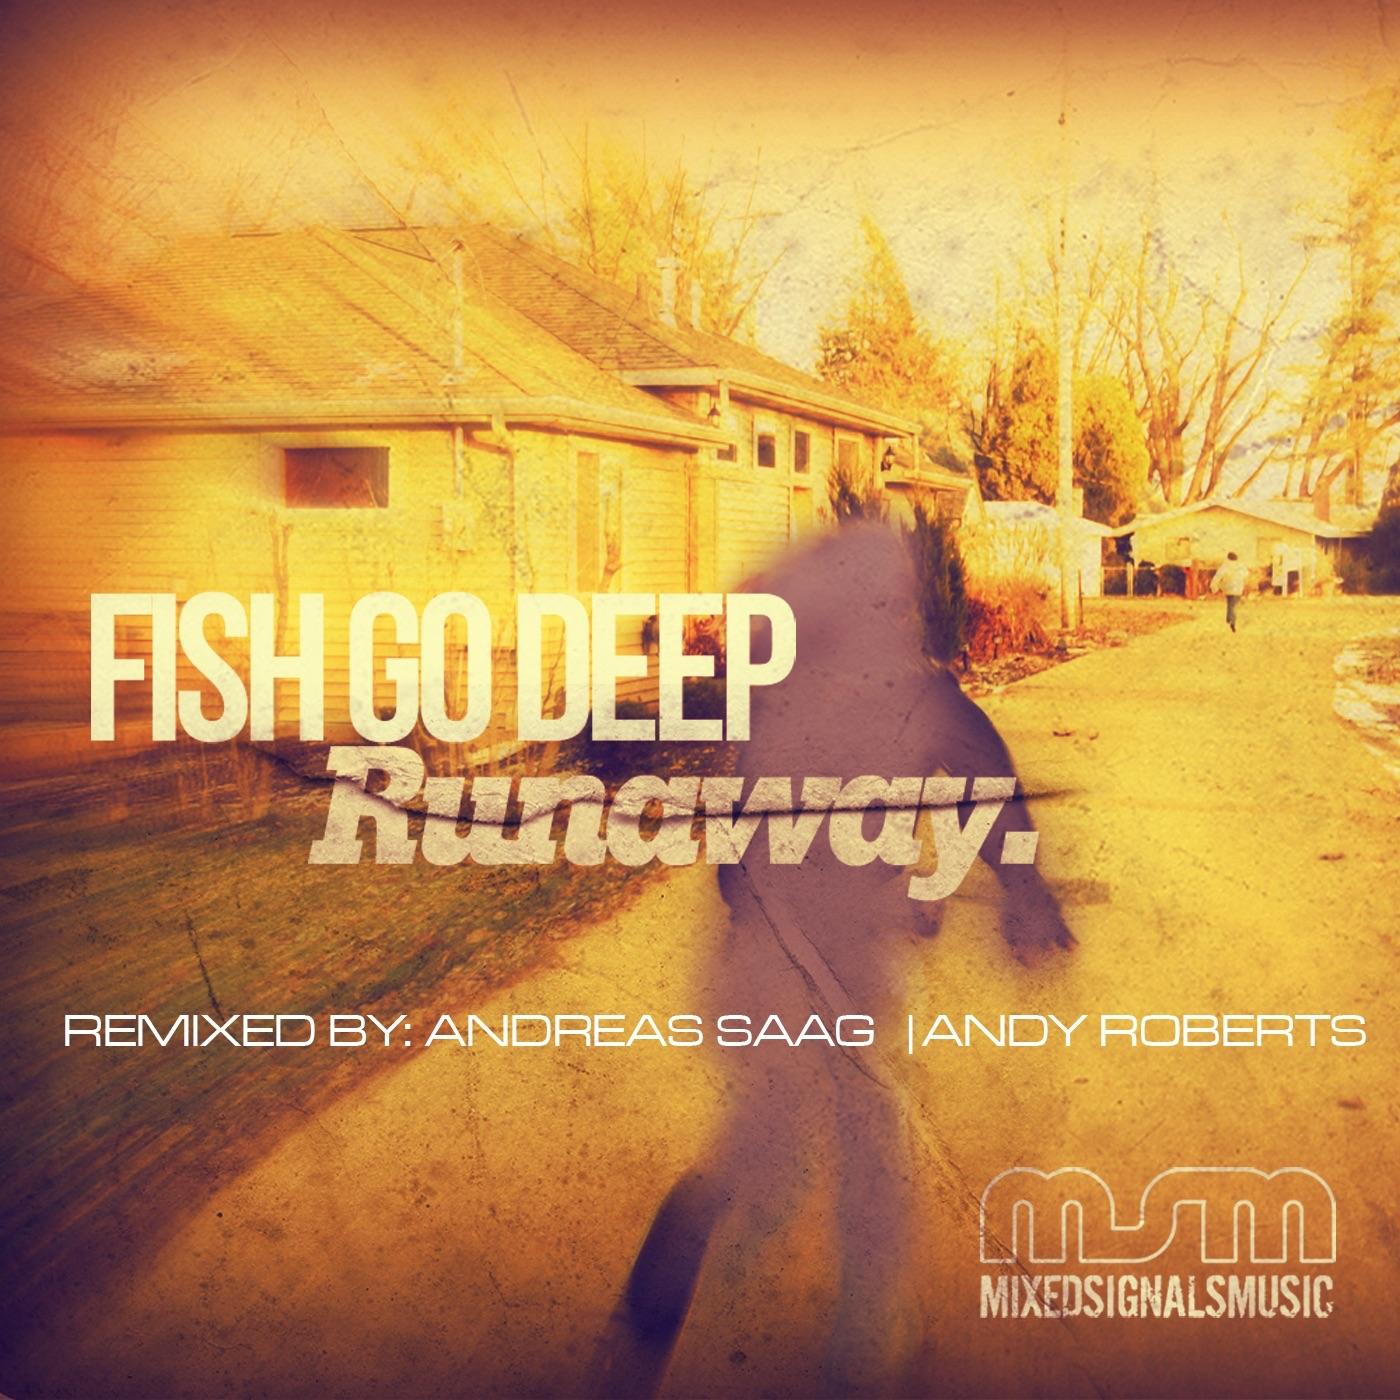 Runaway (Andreas Saag Remix)